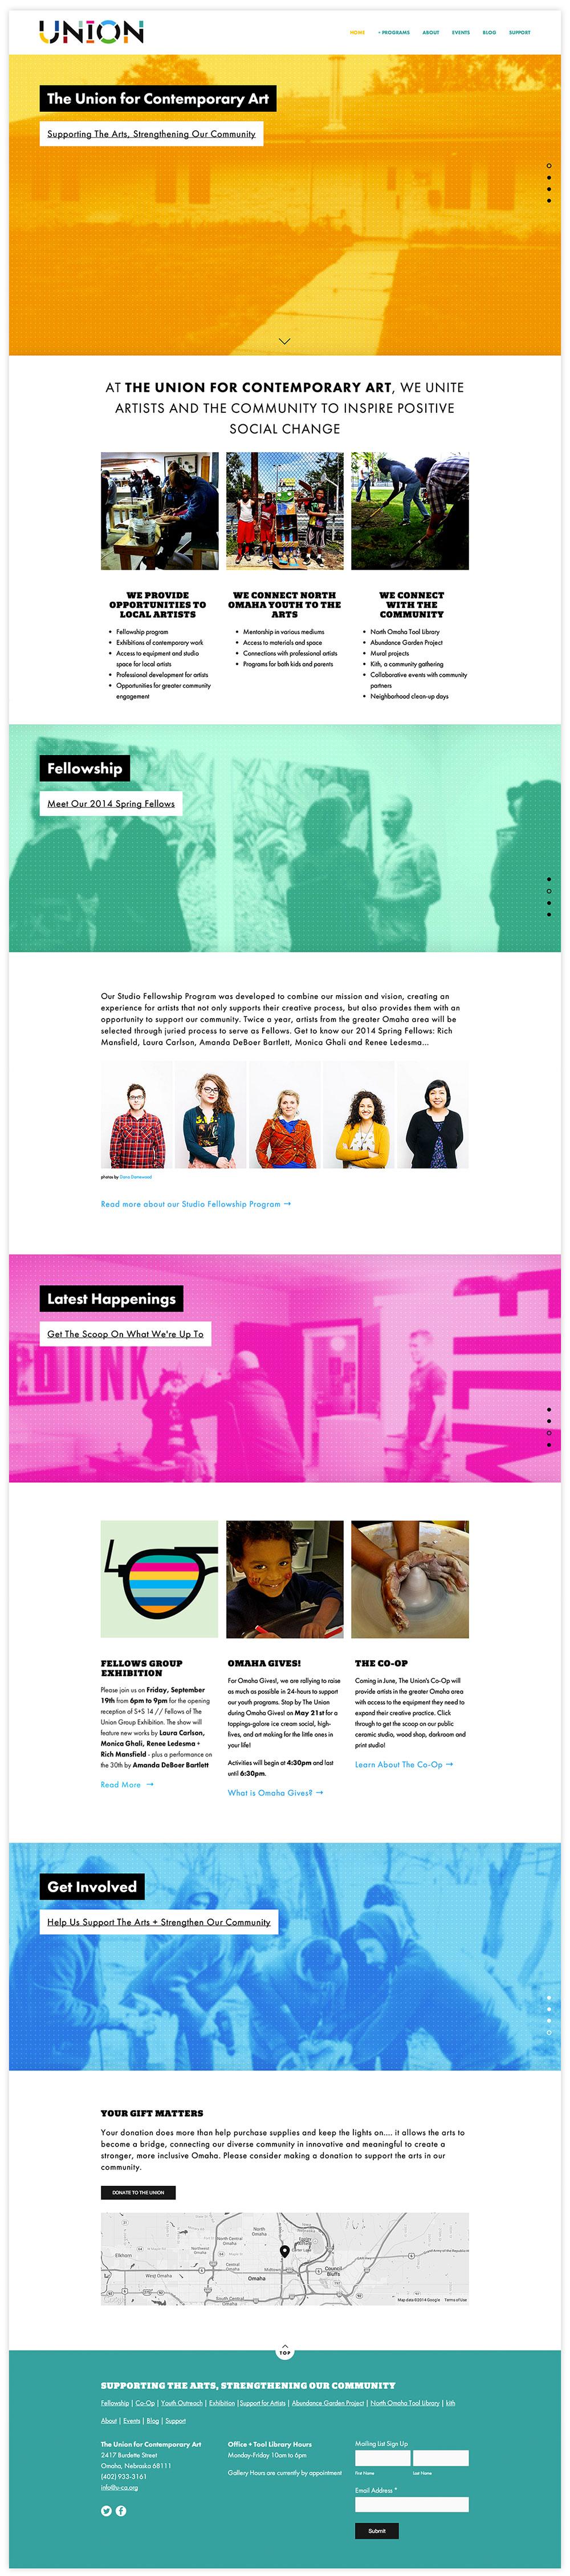 jkdc_union-sitedesign.jpg